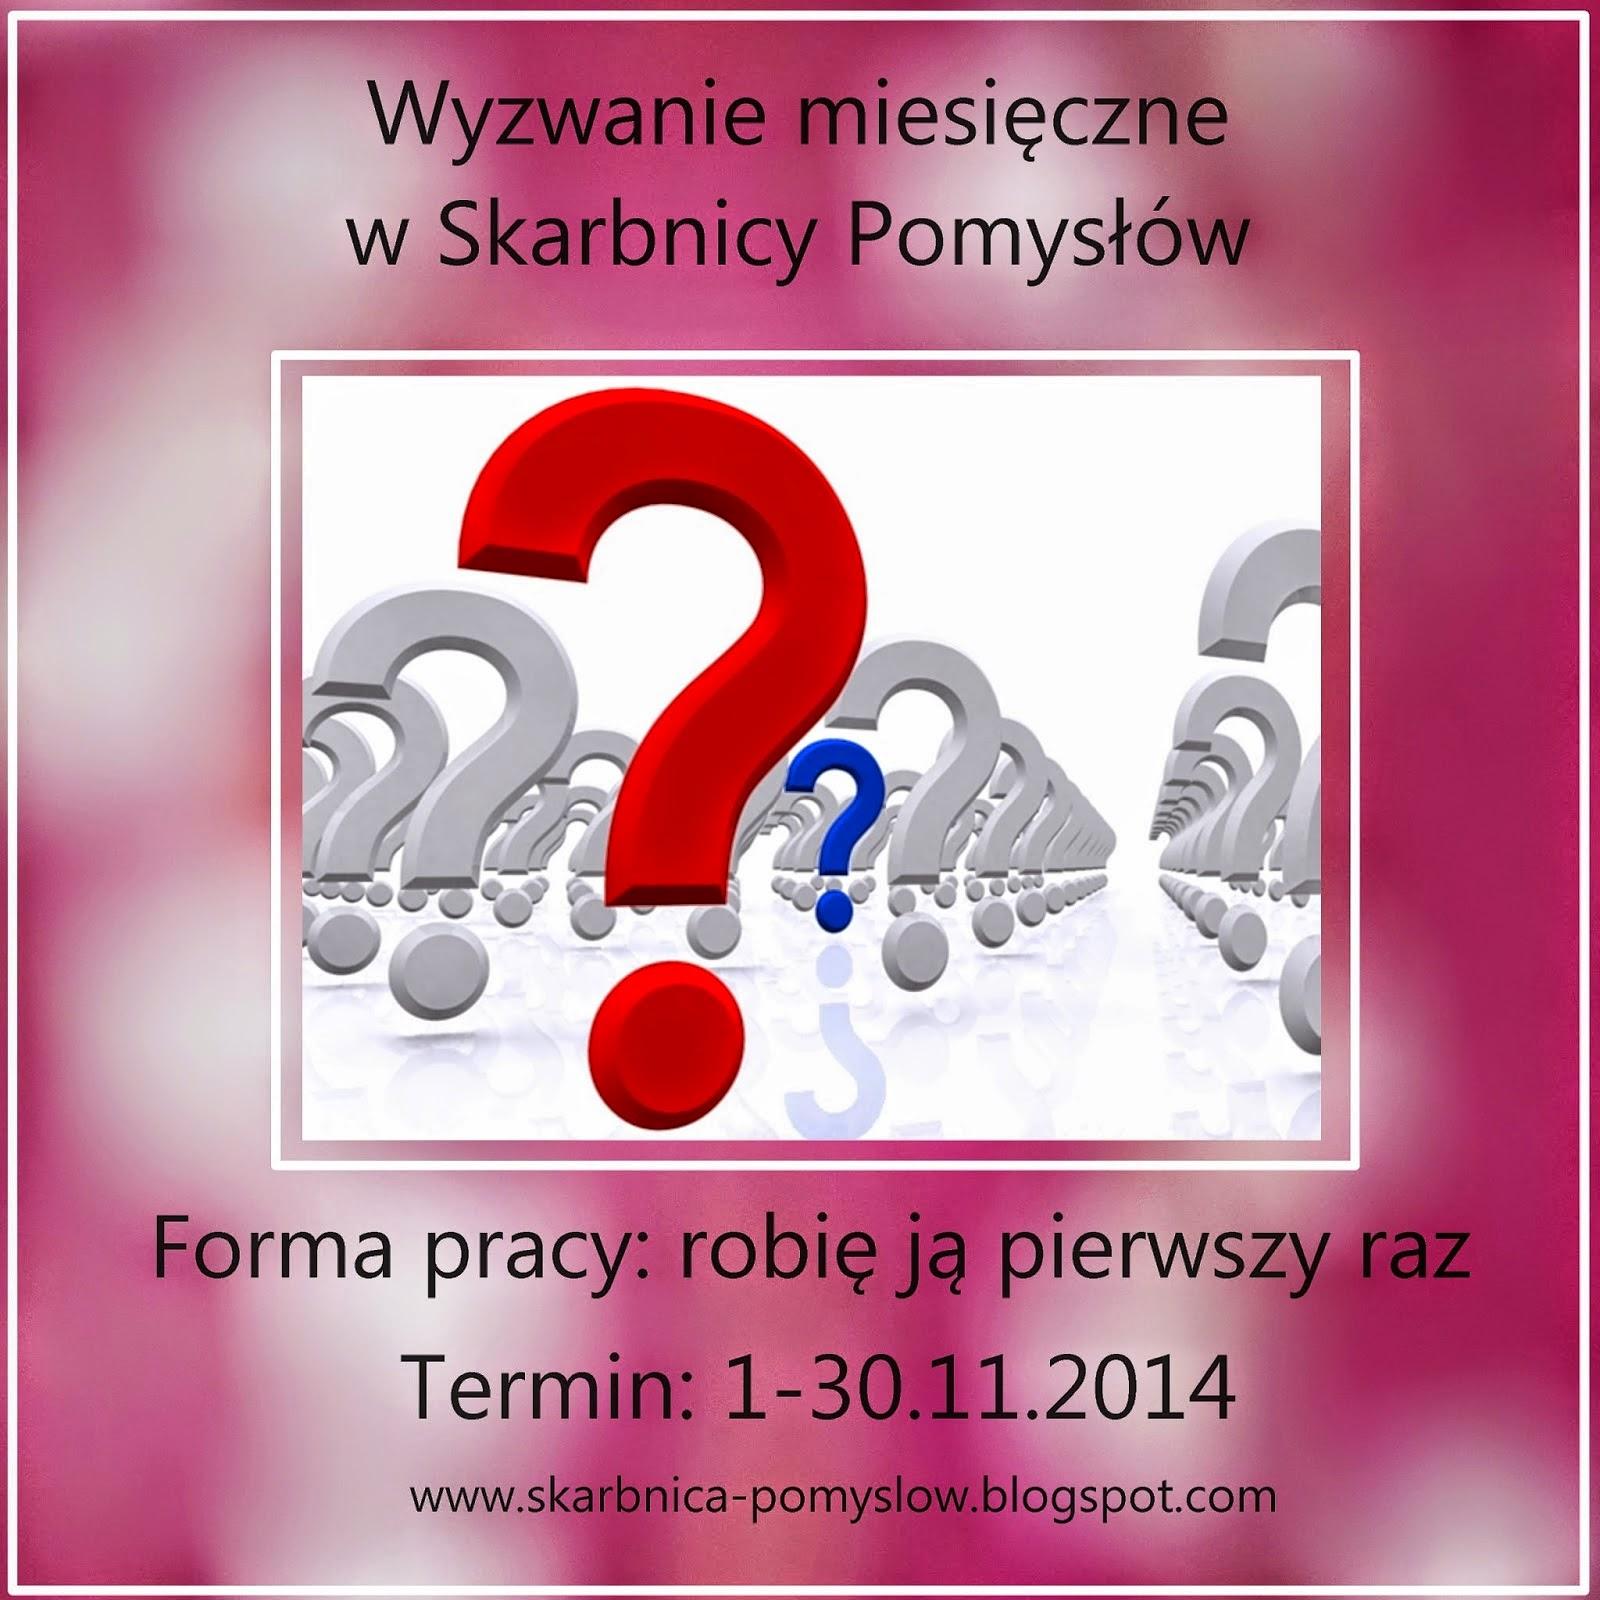 http://skarbnica-pomyslow.blogspot.com/search/label/wyzwanie